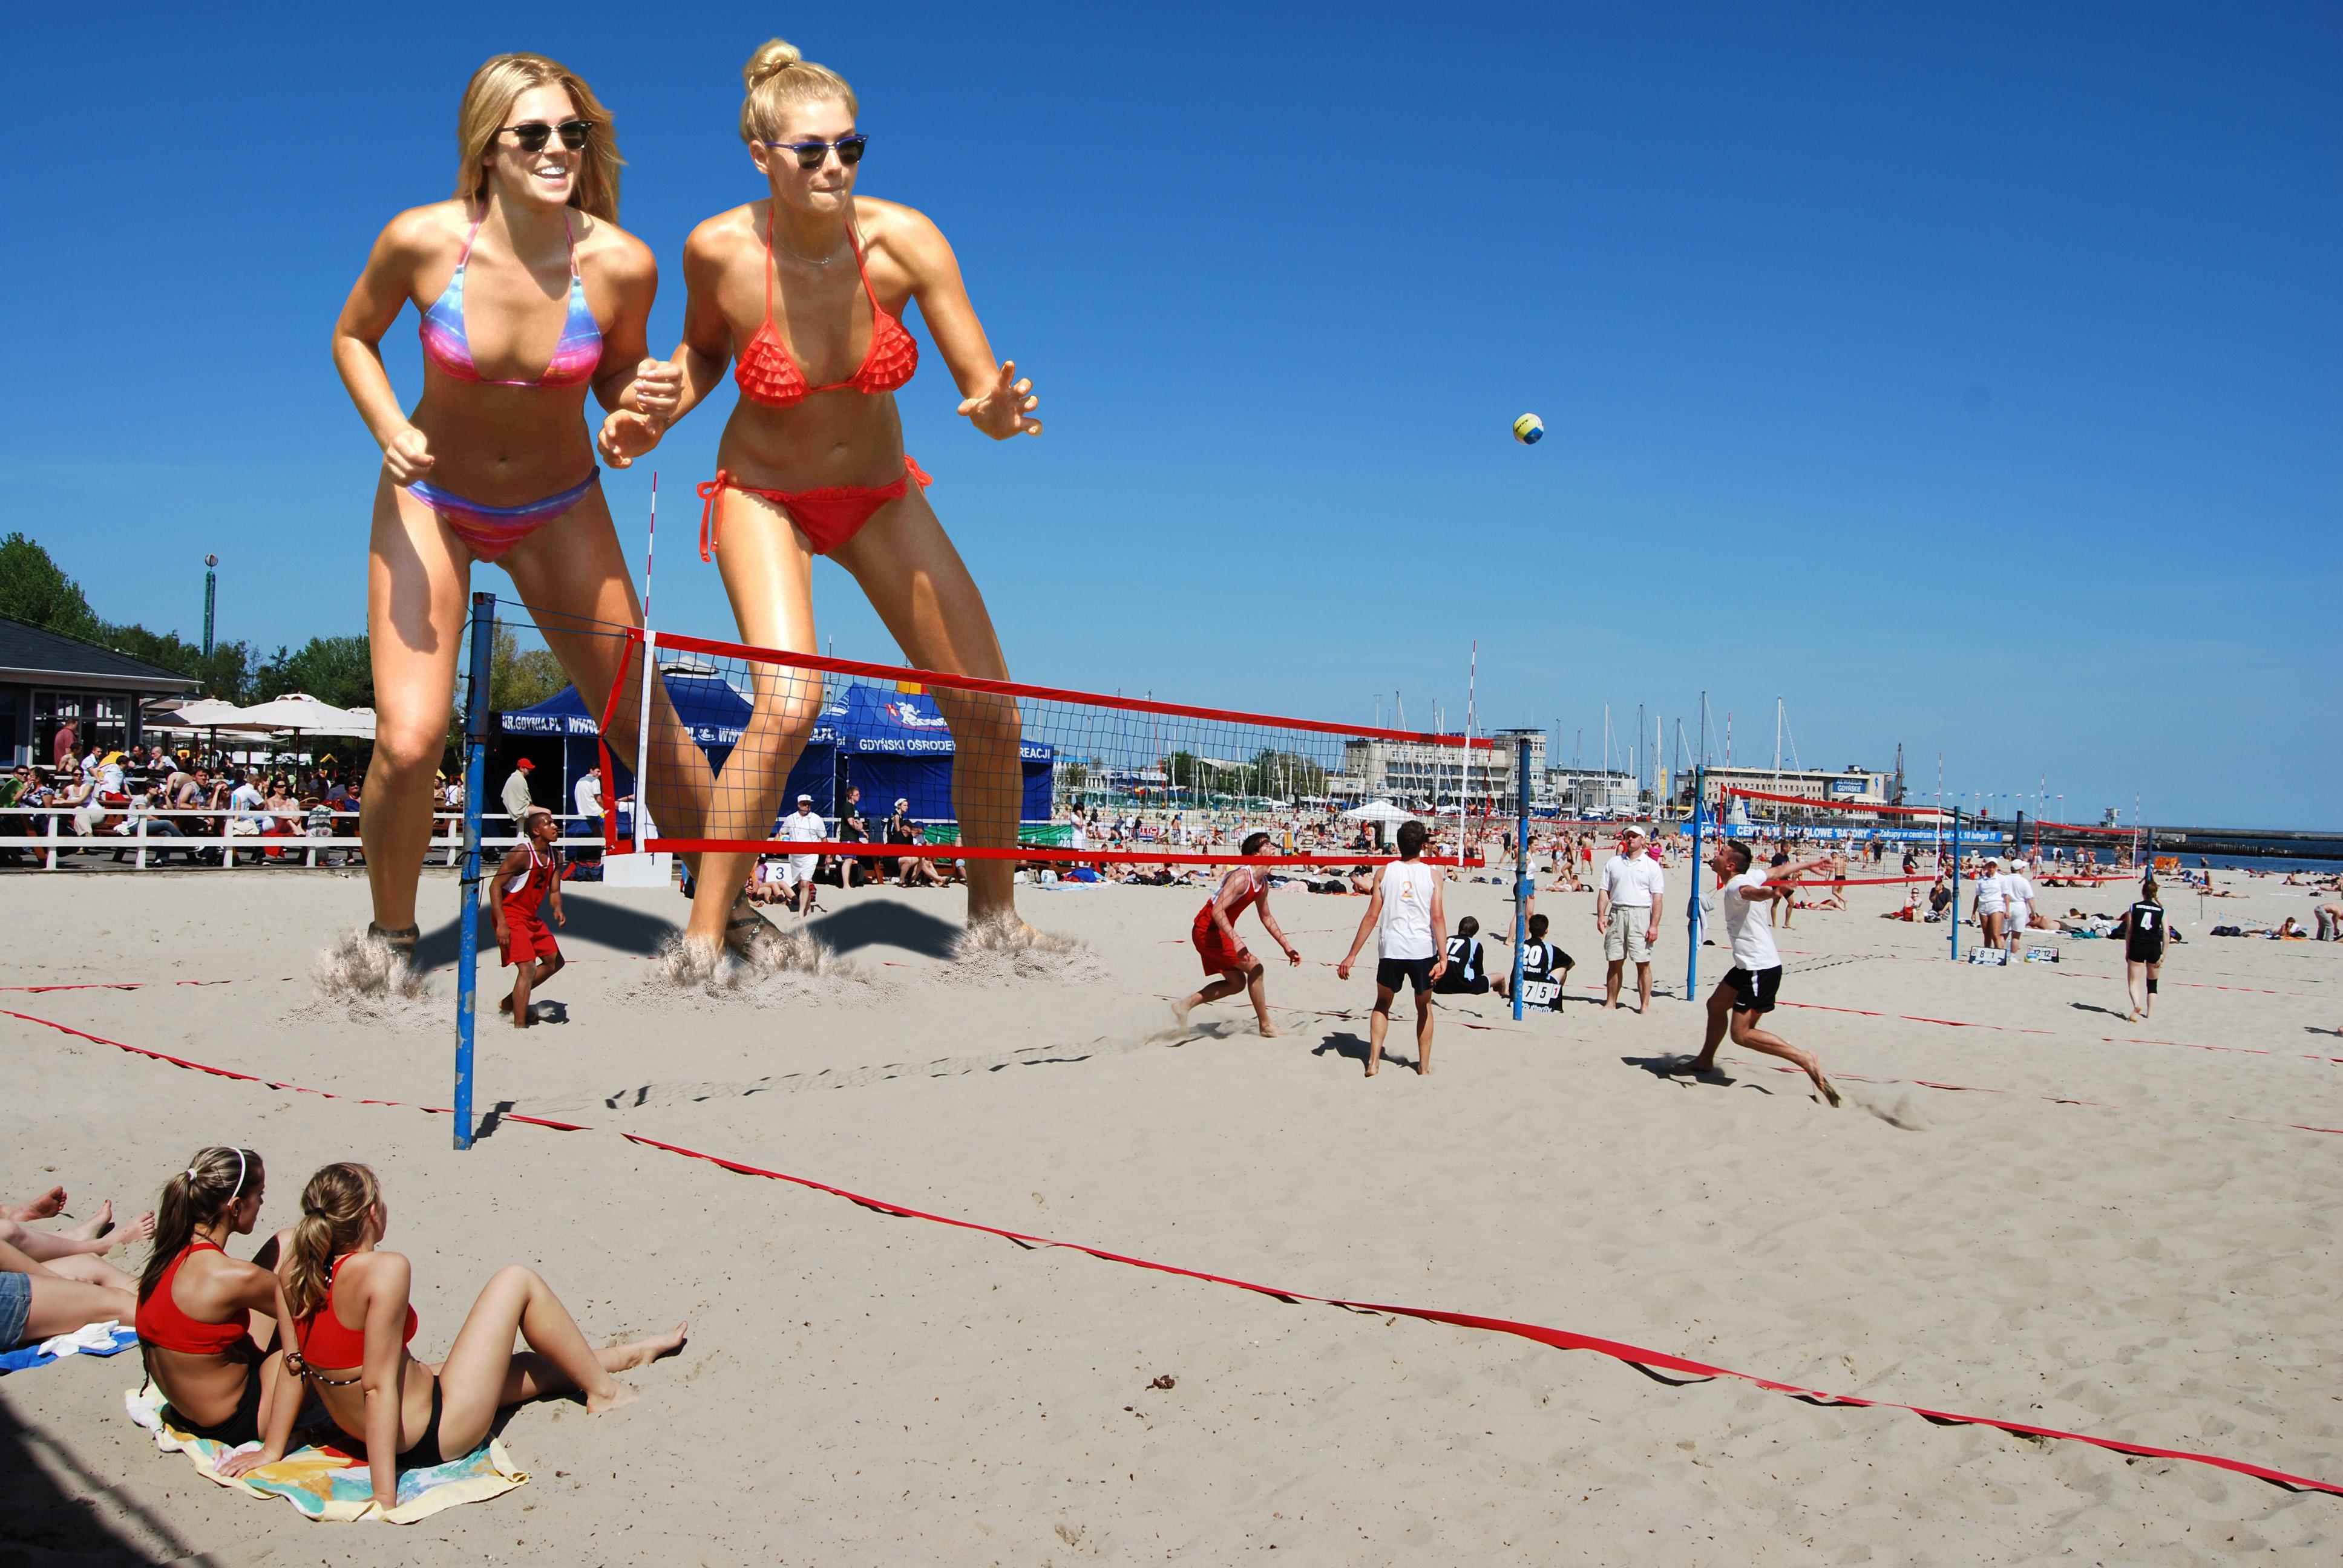 163788 - ashley_hart bikinis blonde collage giantess jessica_hart sand sky small_men sunglasses viewers volleyball wonderslug